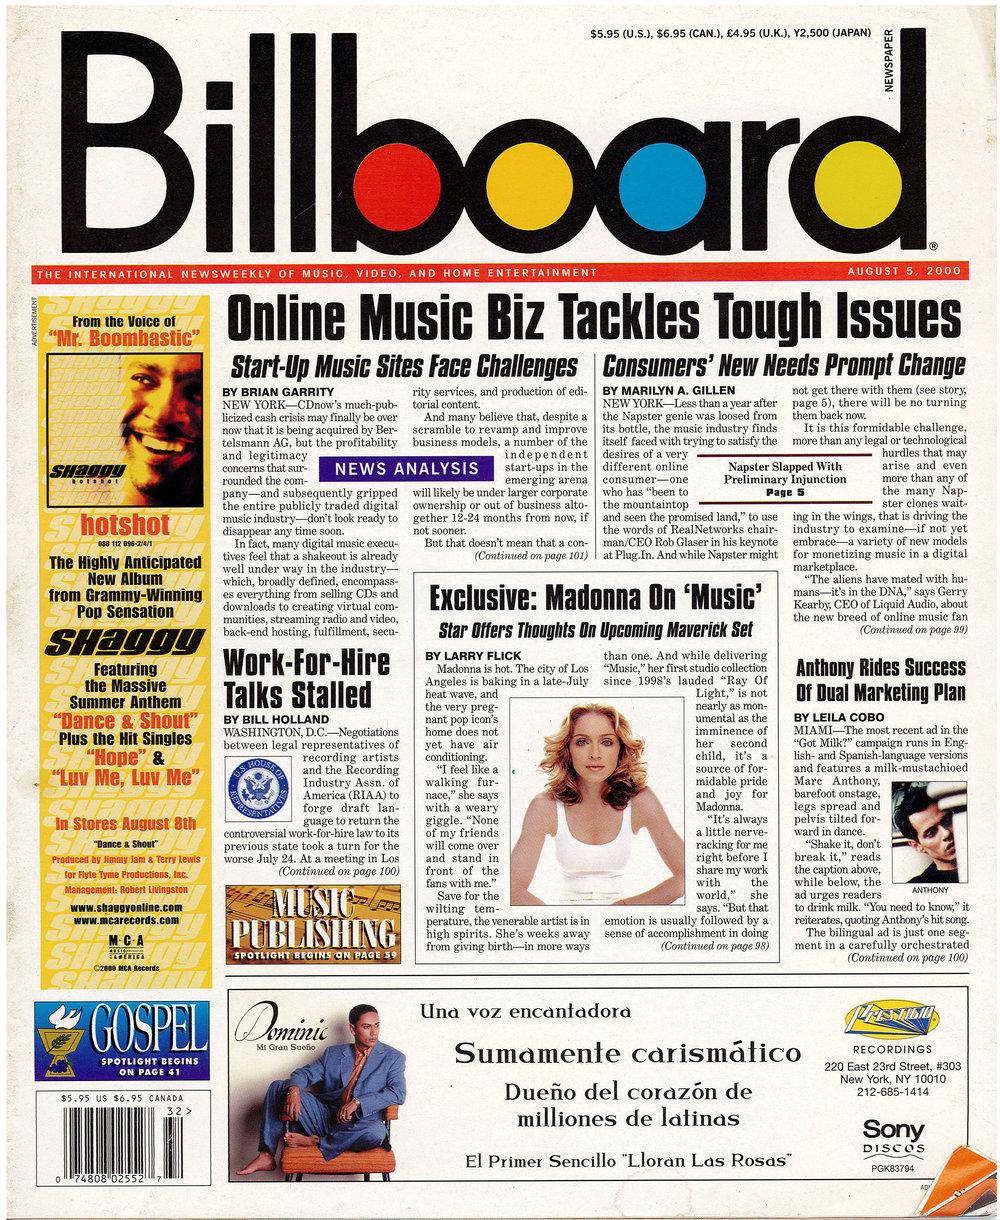 WLWLTDOO-PR-1995-BILLBOARD-08051995-COVER.jpg